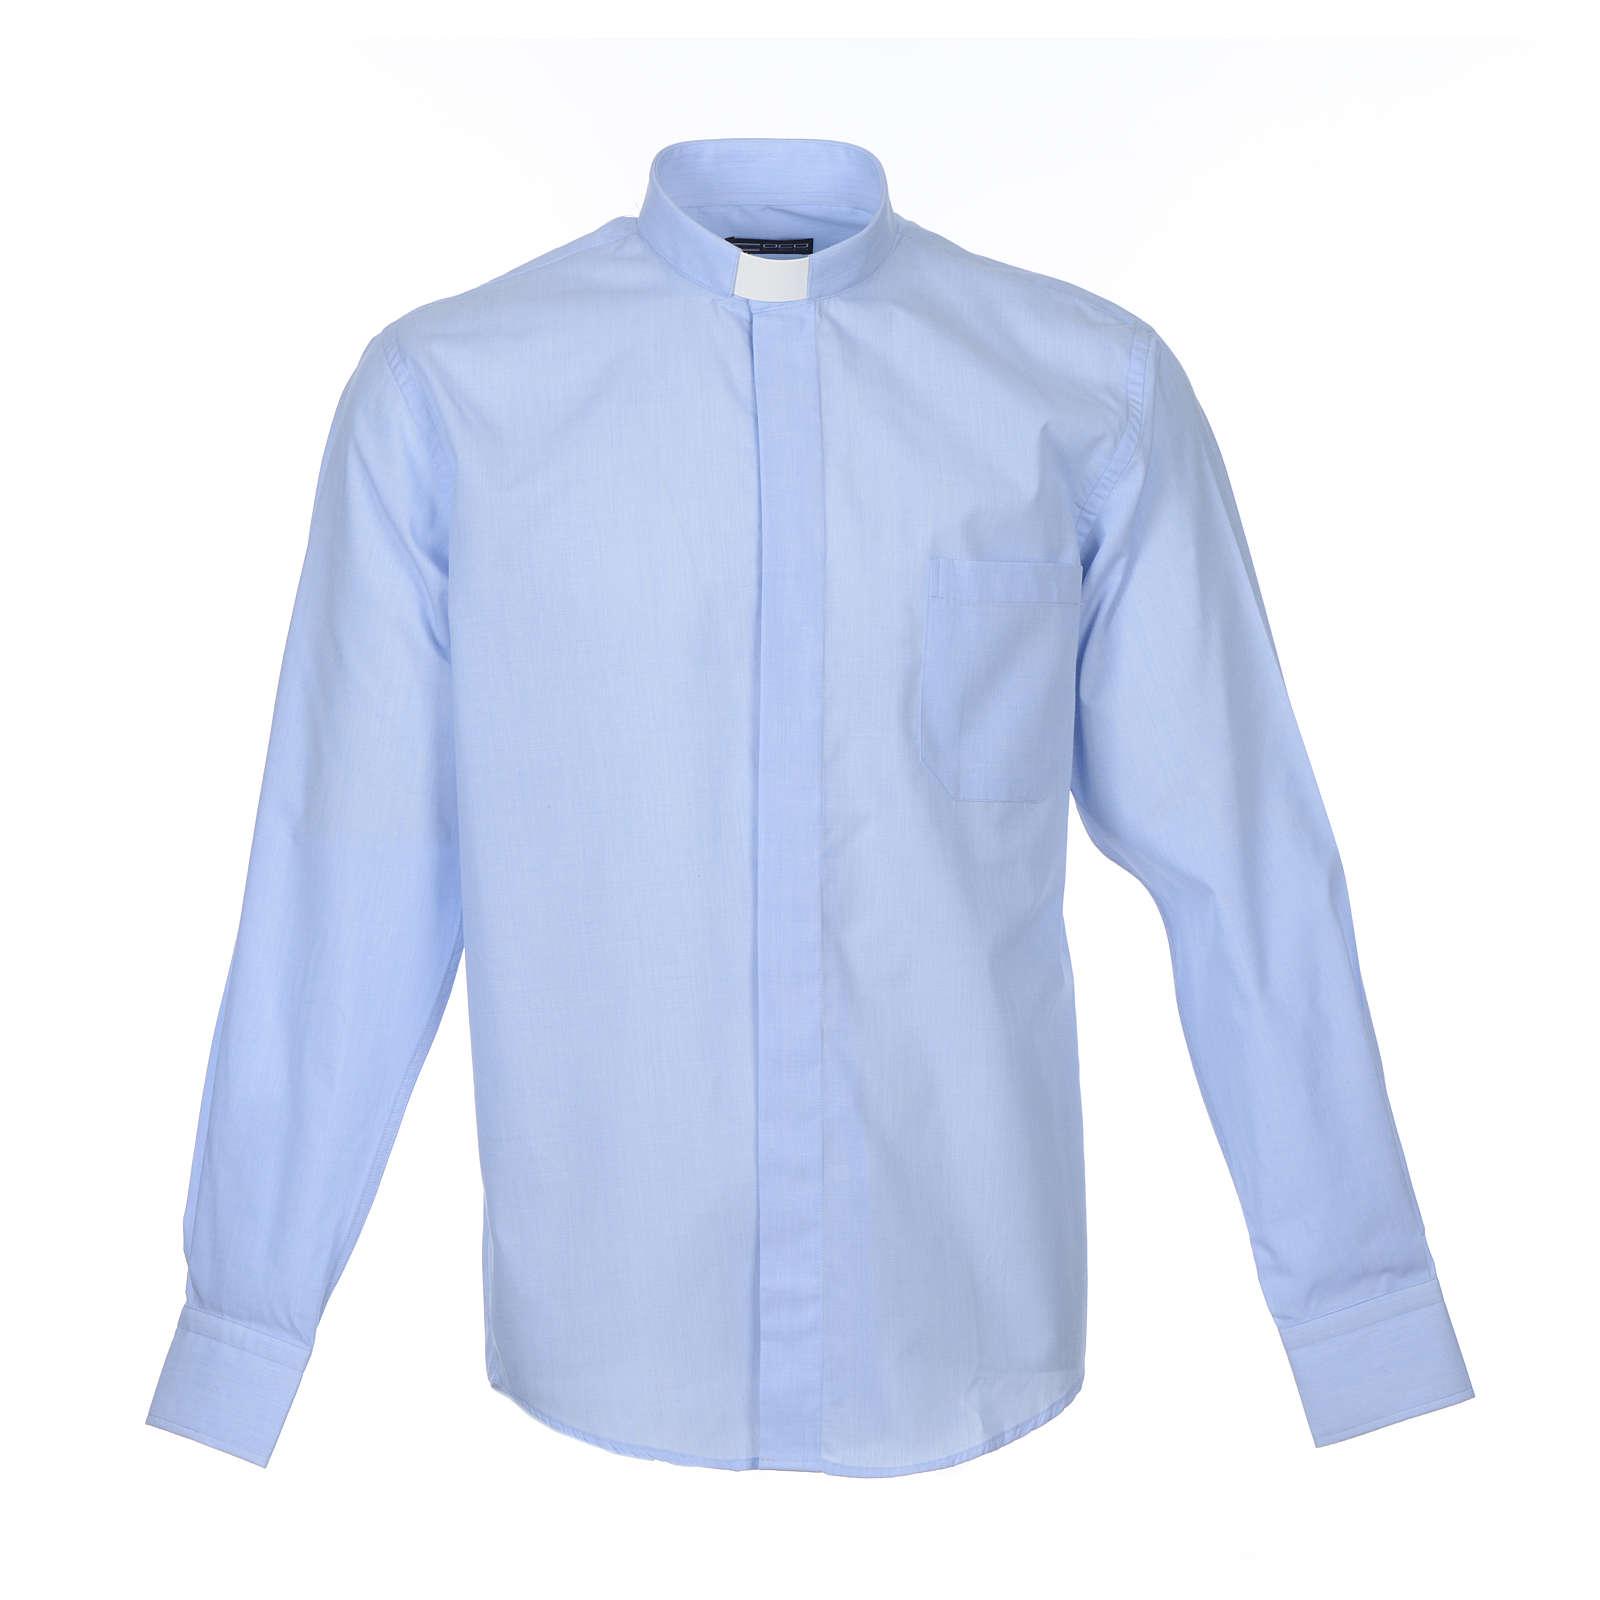 Camisa Clergy Manga Larga Hilo a Hilo, Mixto Algodón Celeste 4